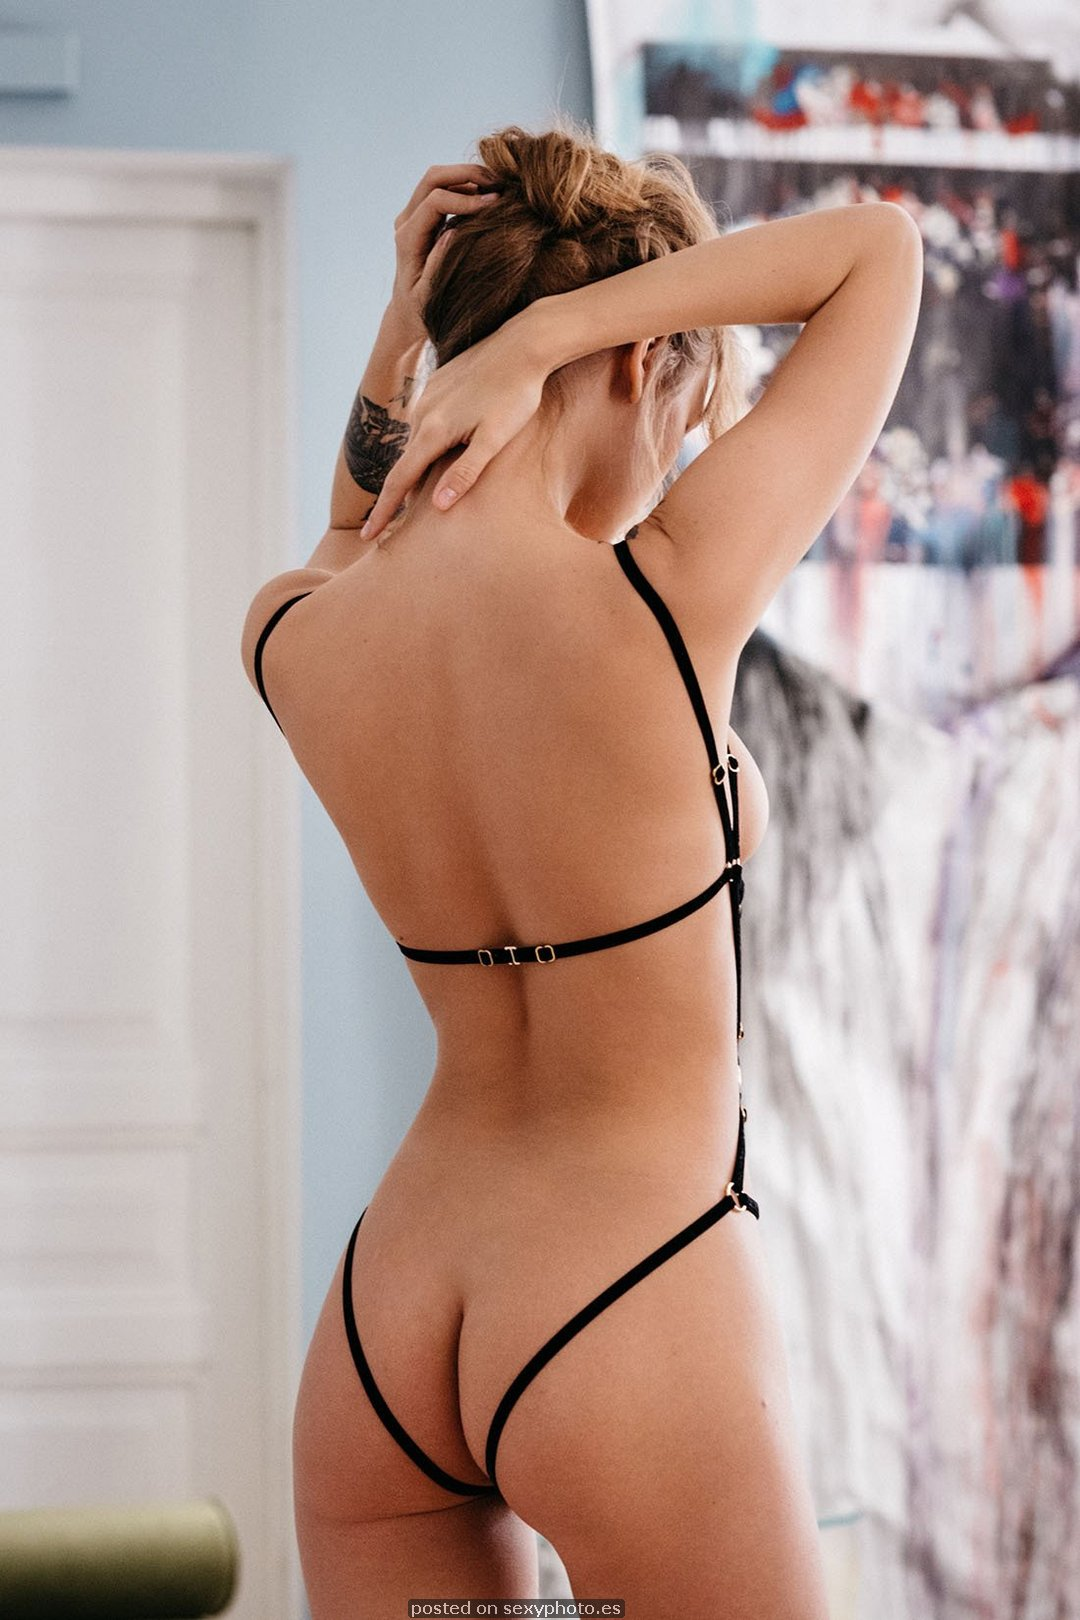 boobs, ANASTASIYA SCHEGLOVA nude, ANASTASIYA SCHEGLOVA celebrity nipples_11